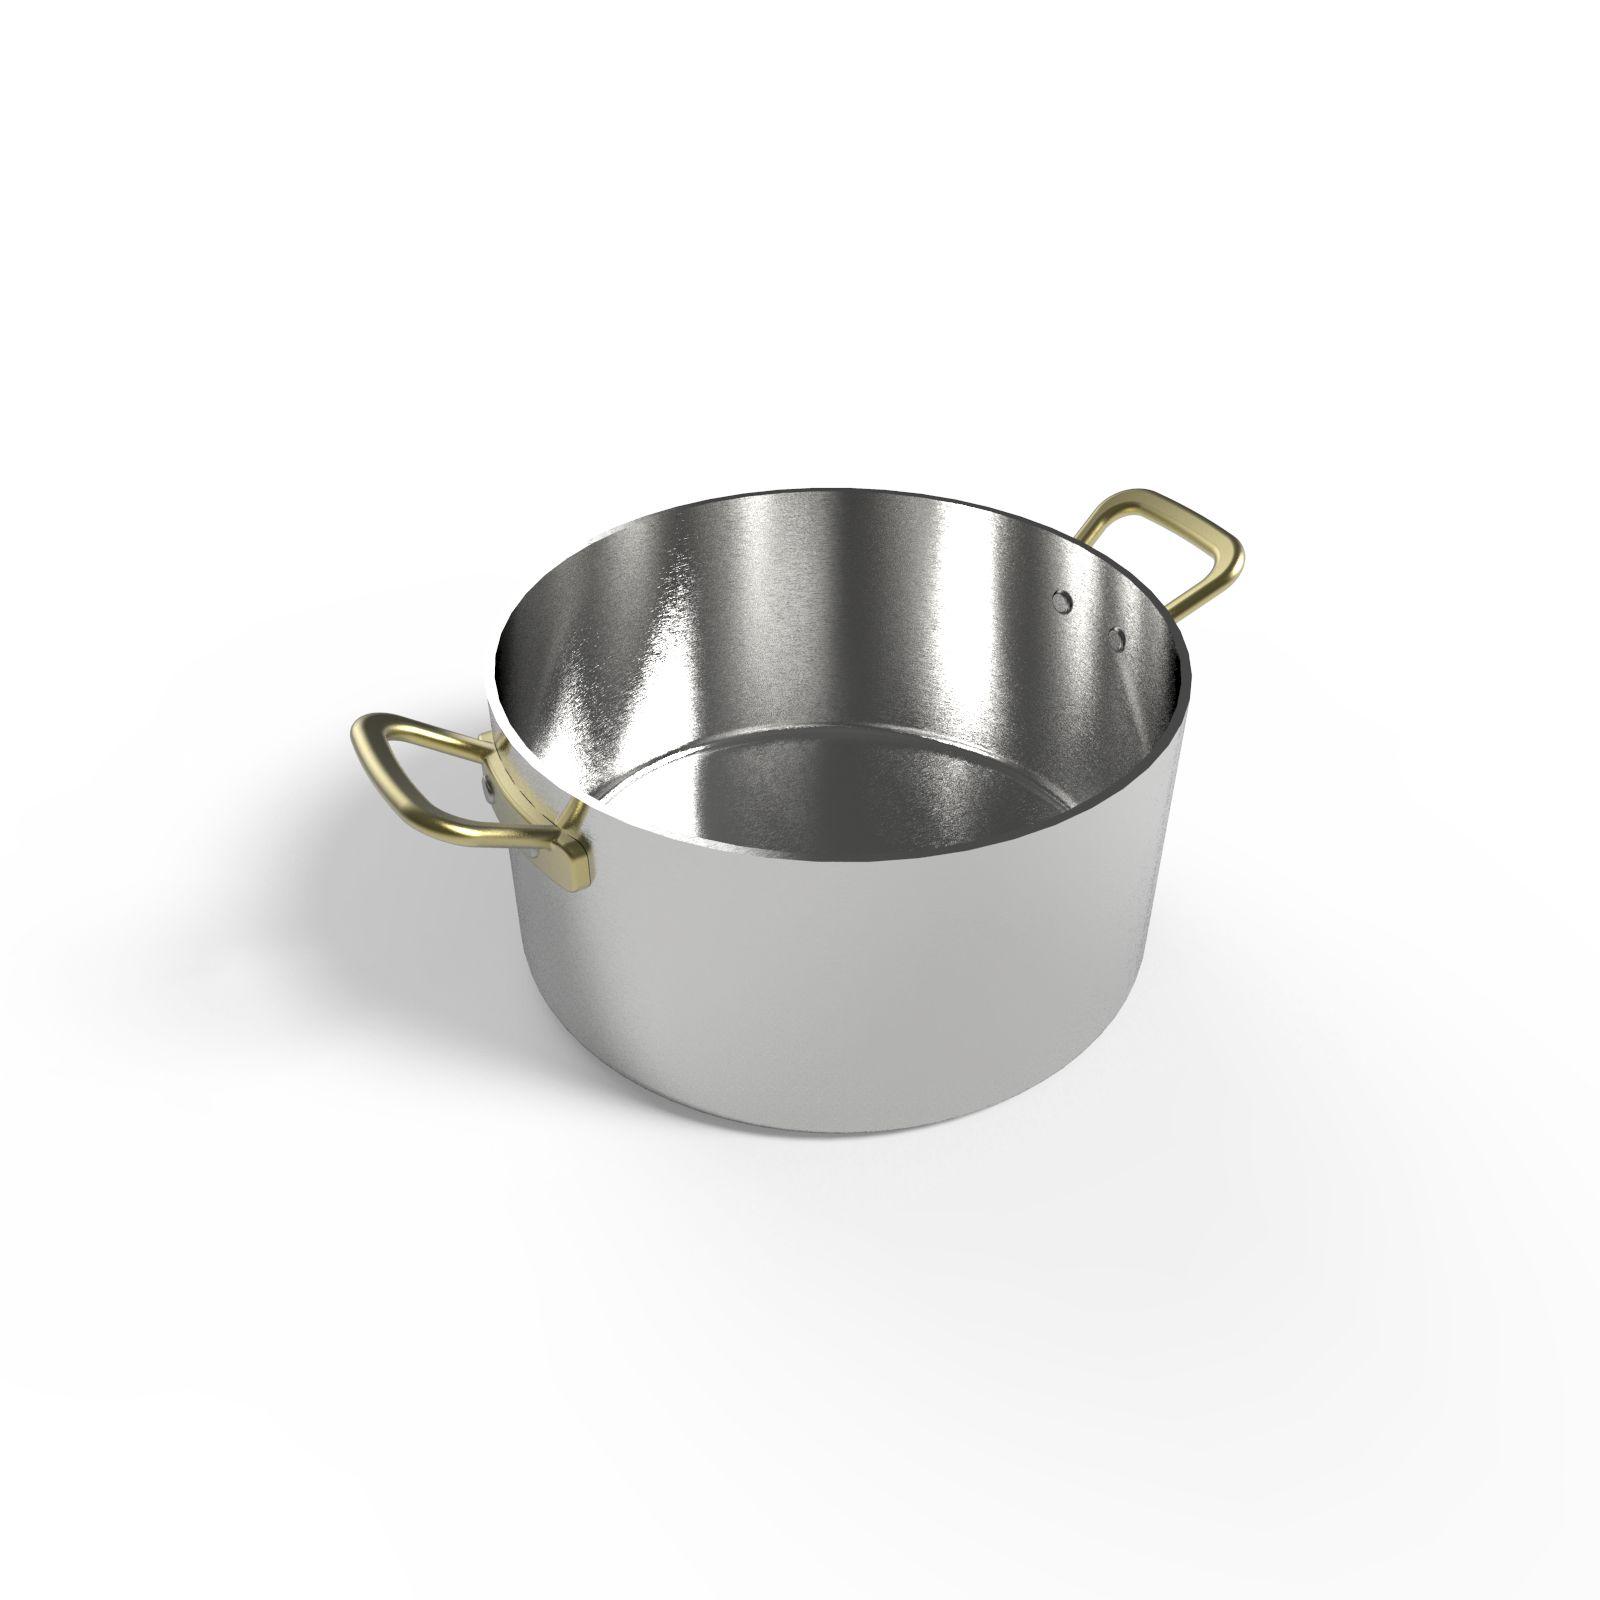 Cacerola de aluminio 14 cm ajidise o - Accesorios para catering ...